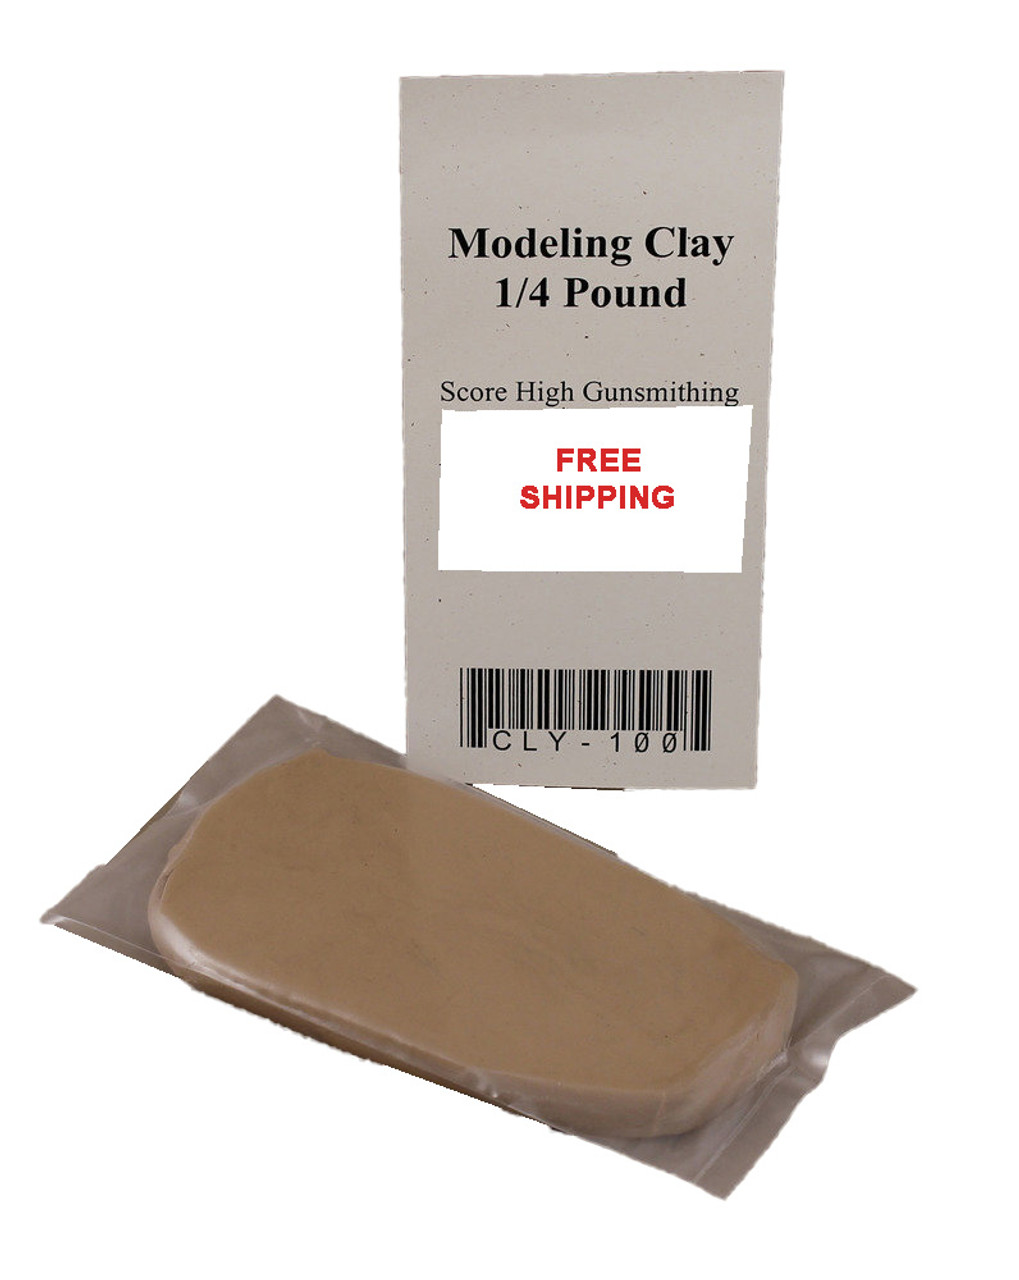 Score High Gunsmithing Modeling Clay 1/4 Pound